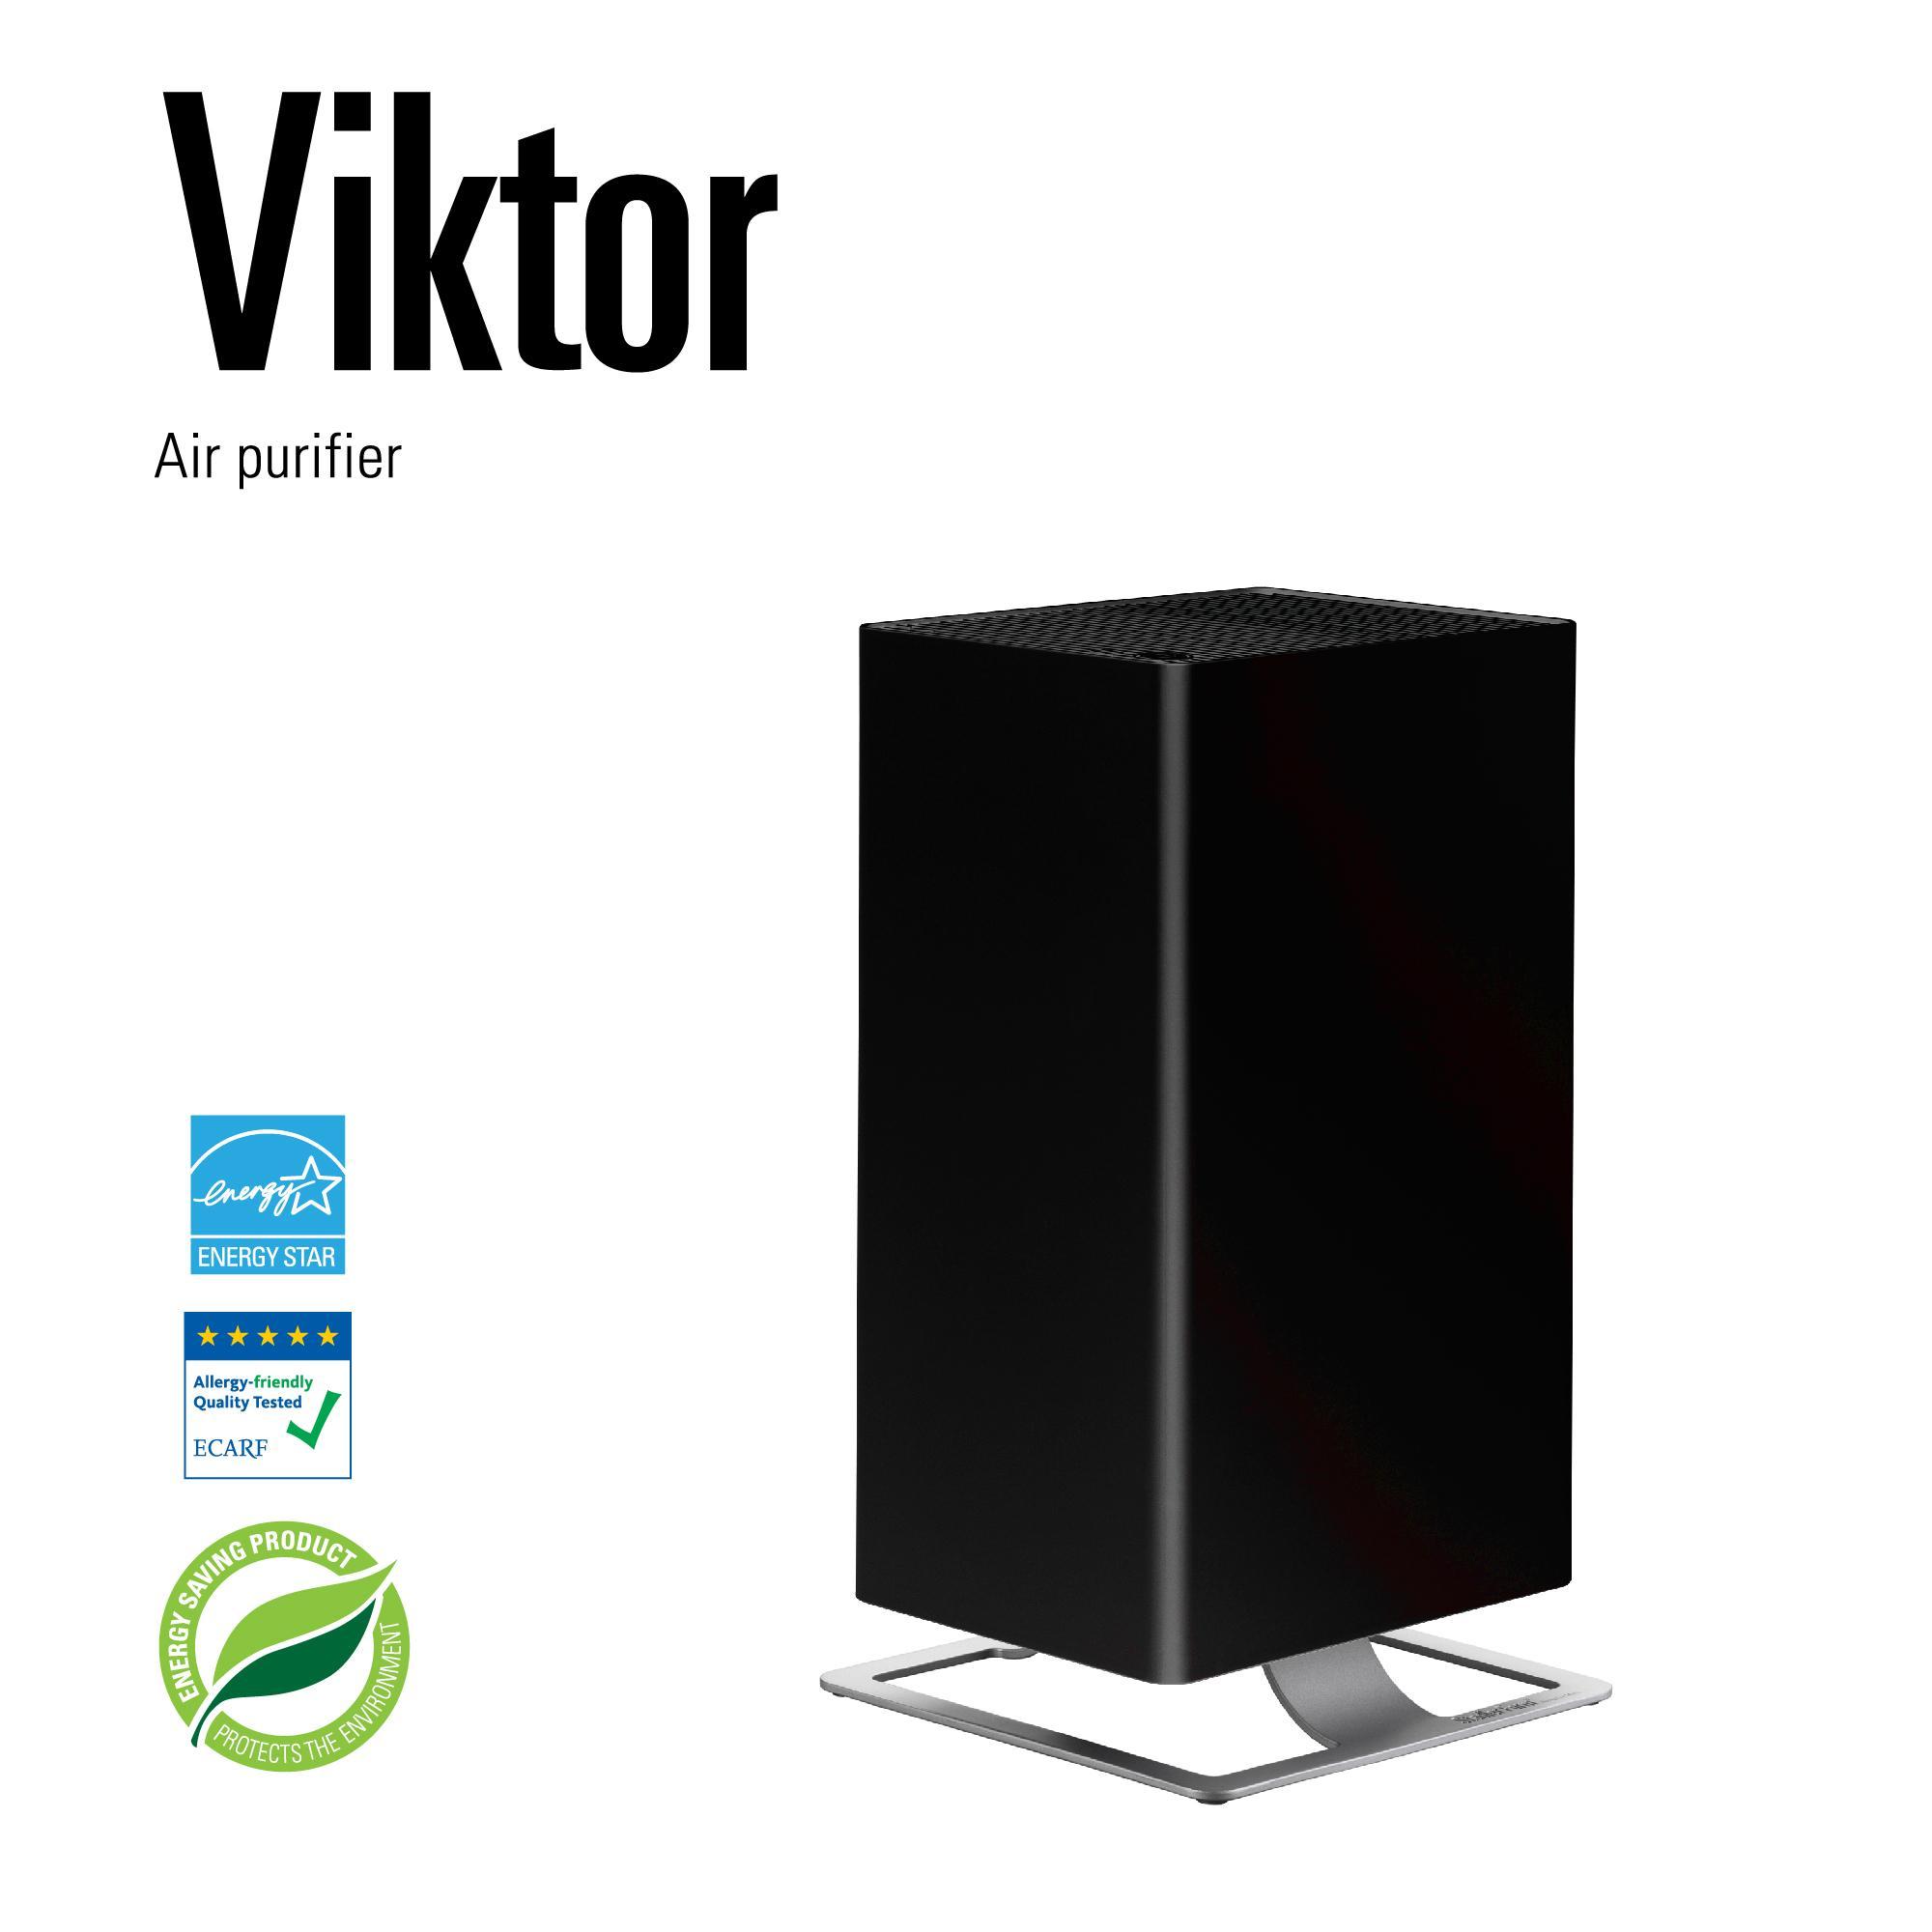 Promo Stadler Form Viktor With 5 Cleaning Levels Washable Hpp Active Carbon Filters Black